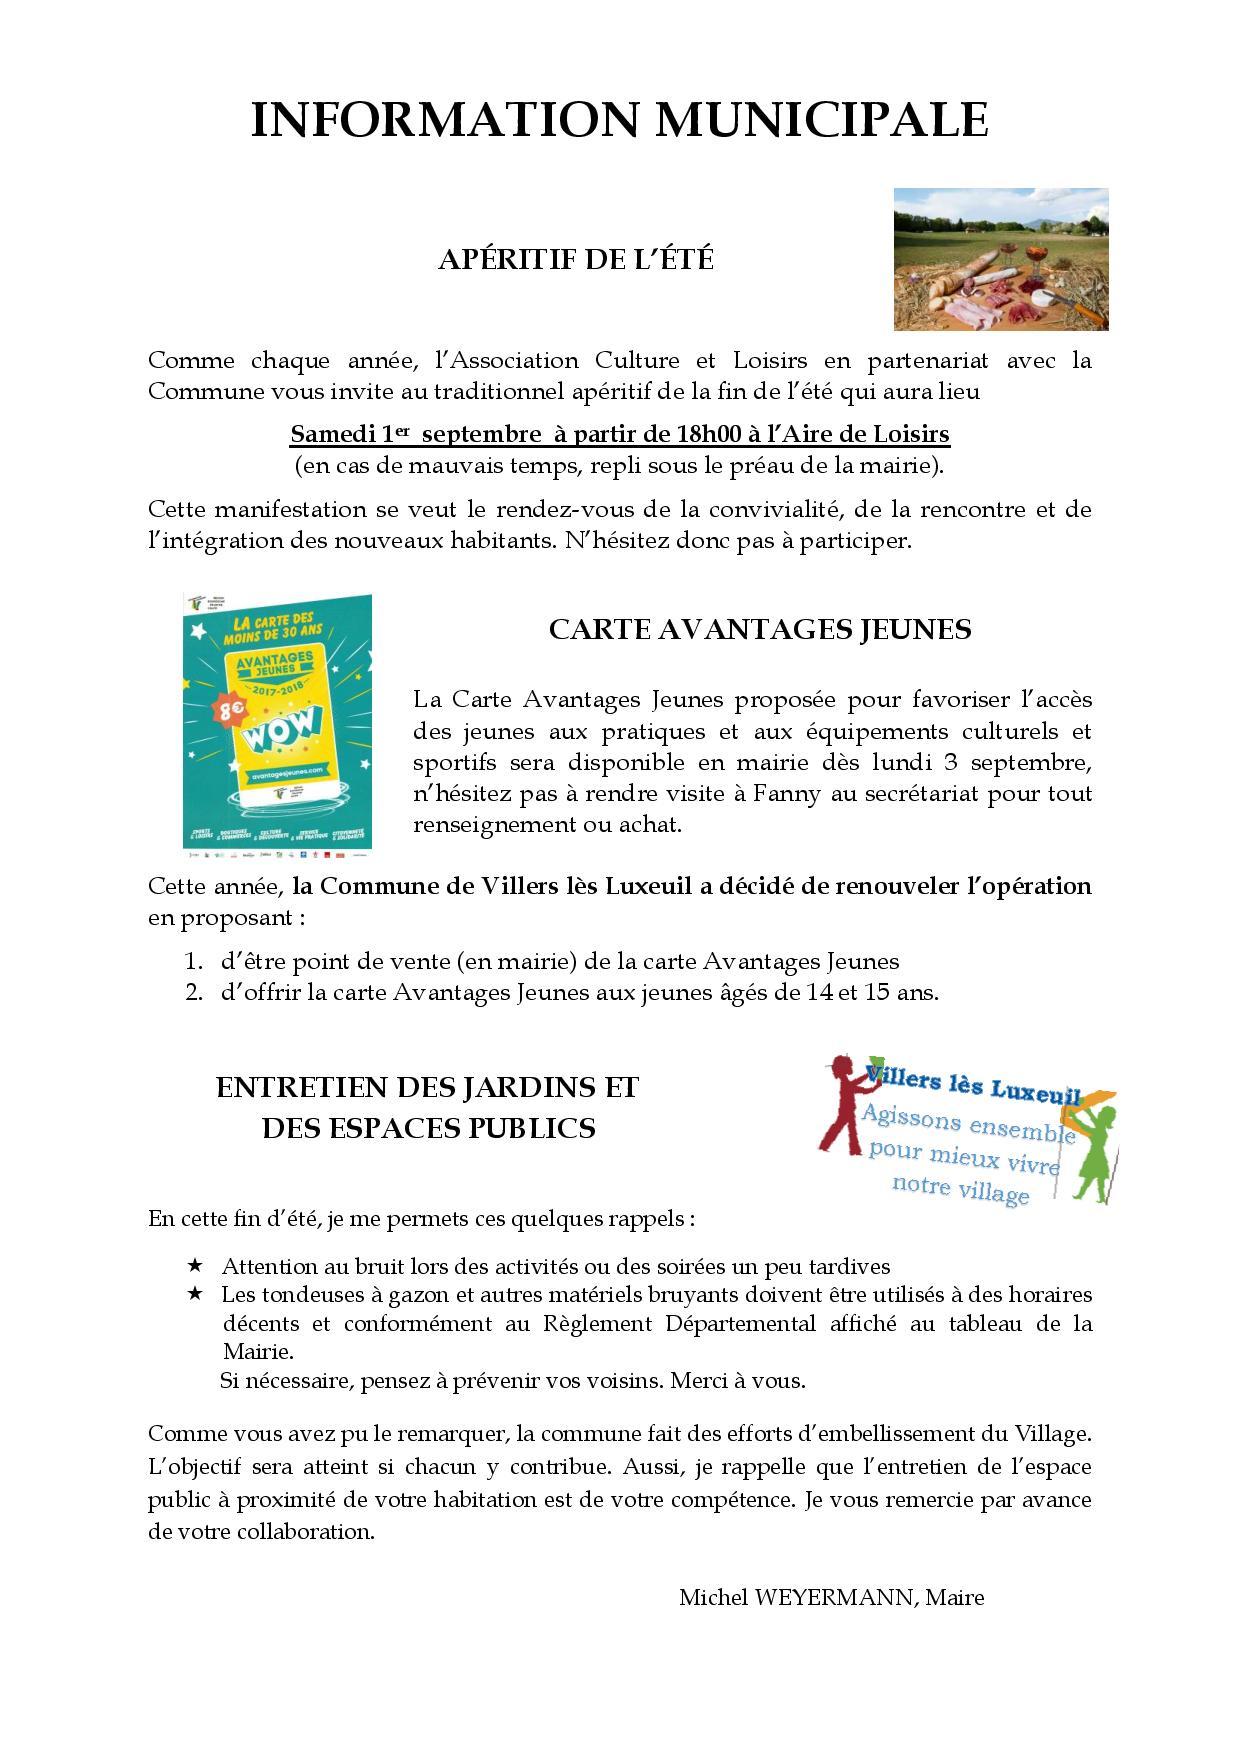 https://www.villers-les-luxeuil.com/projets/villers/files/images/2018_Mairie/Divers_pour_site/Information_Municipale_aout_2018_version_vll.jpg